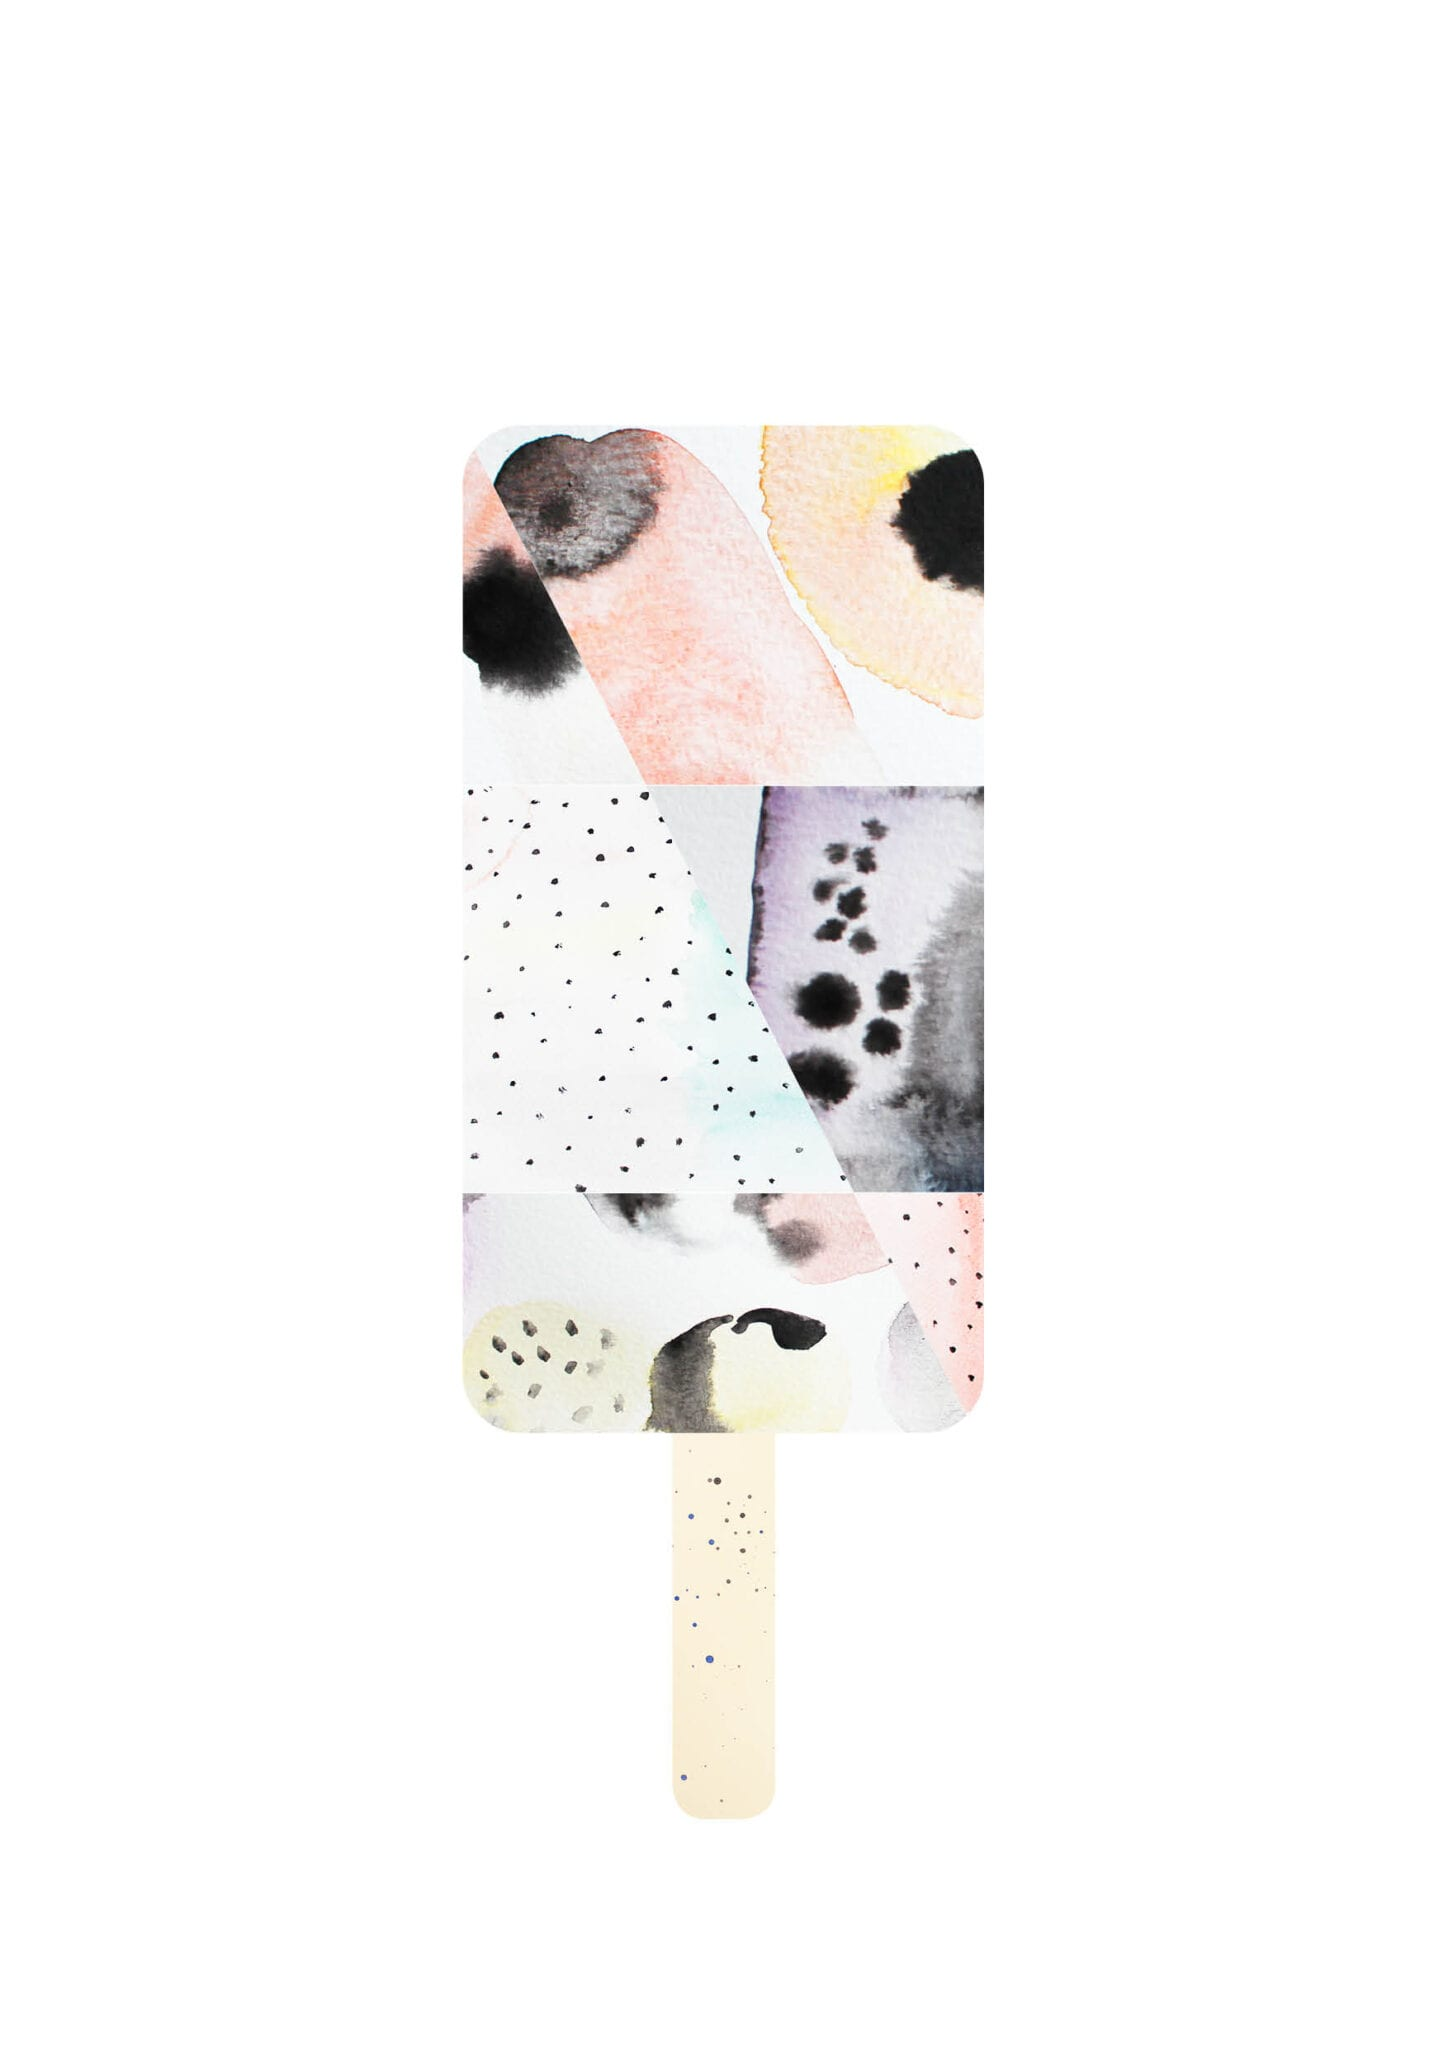 Nynne Rosenvinge - Art no 45, Peach